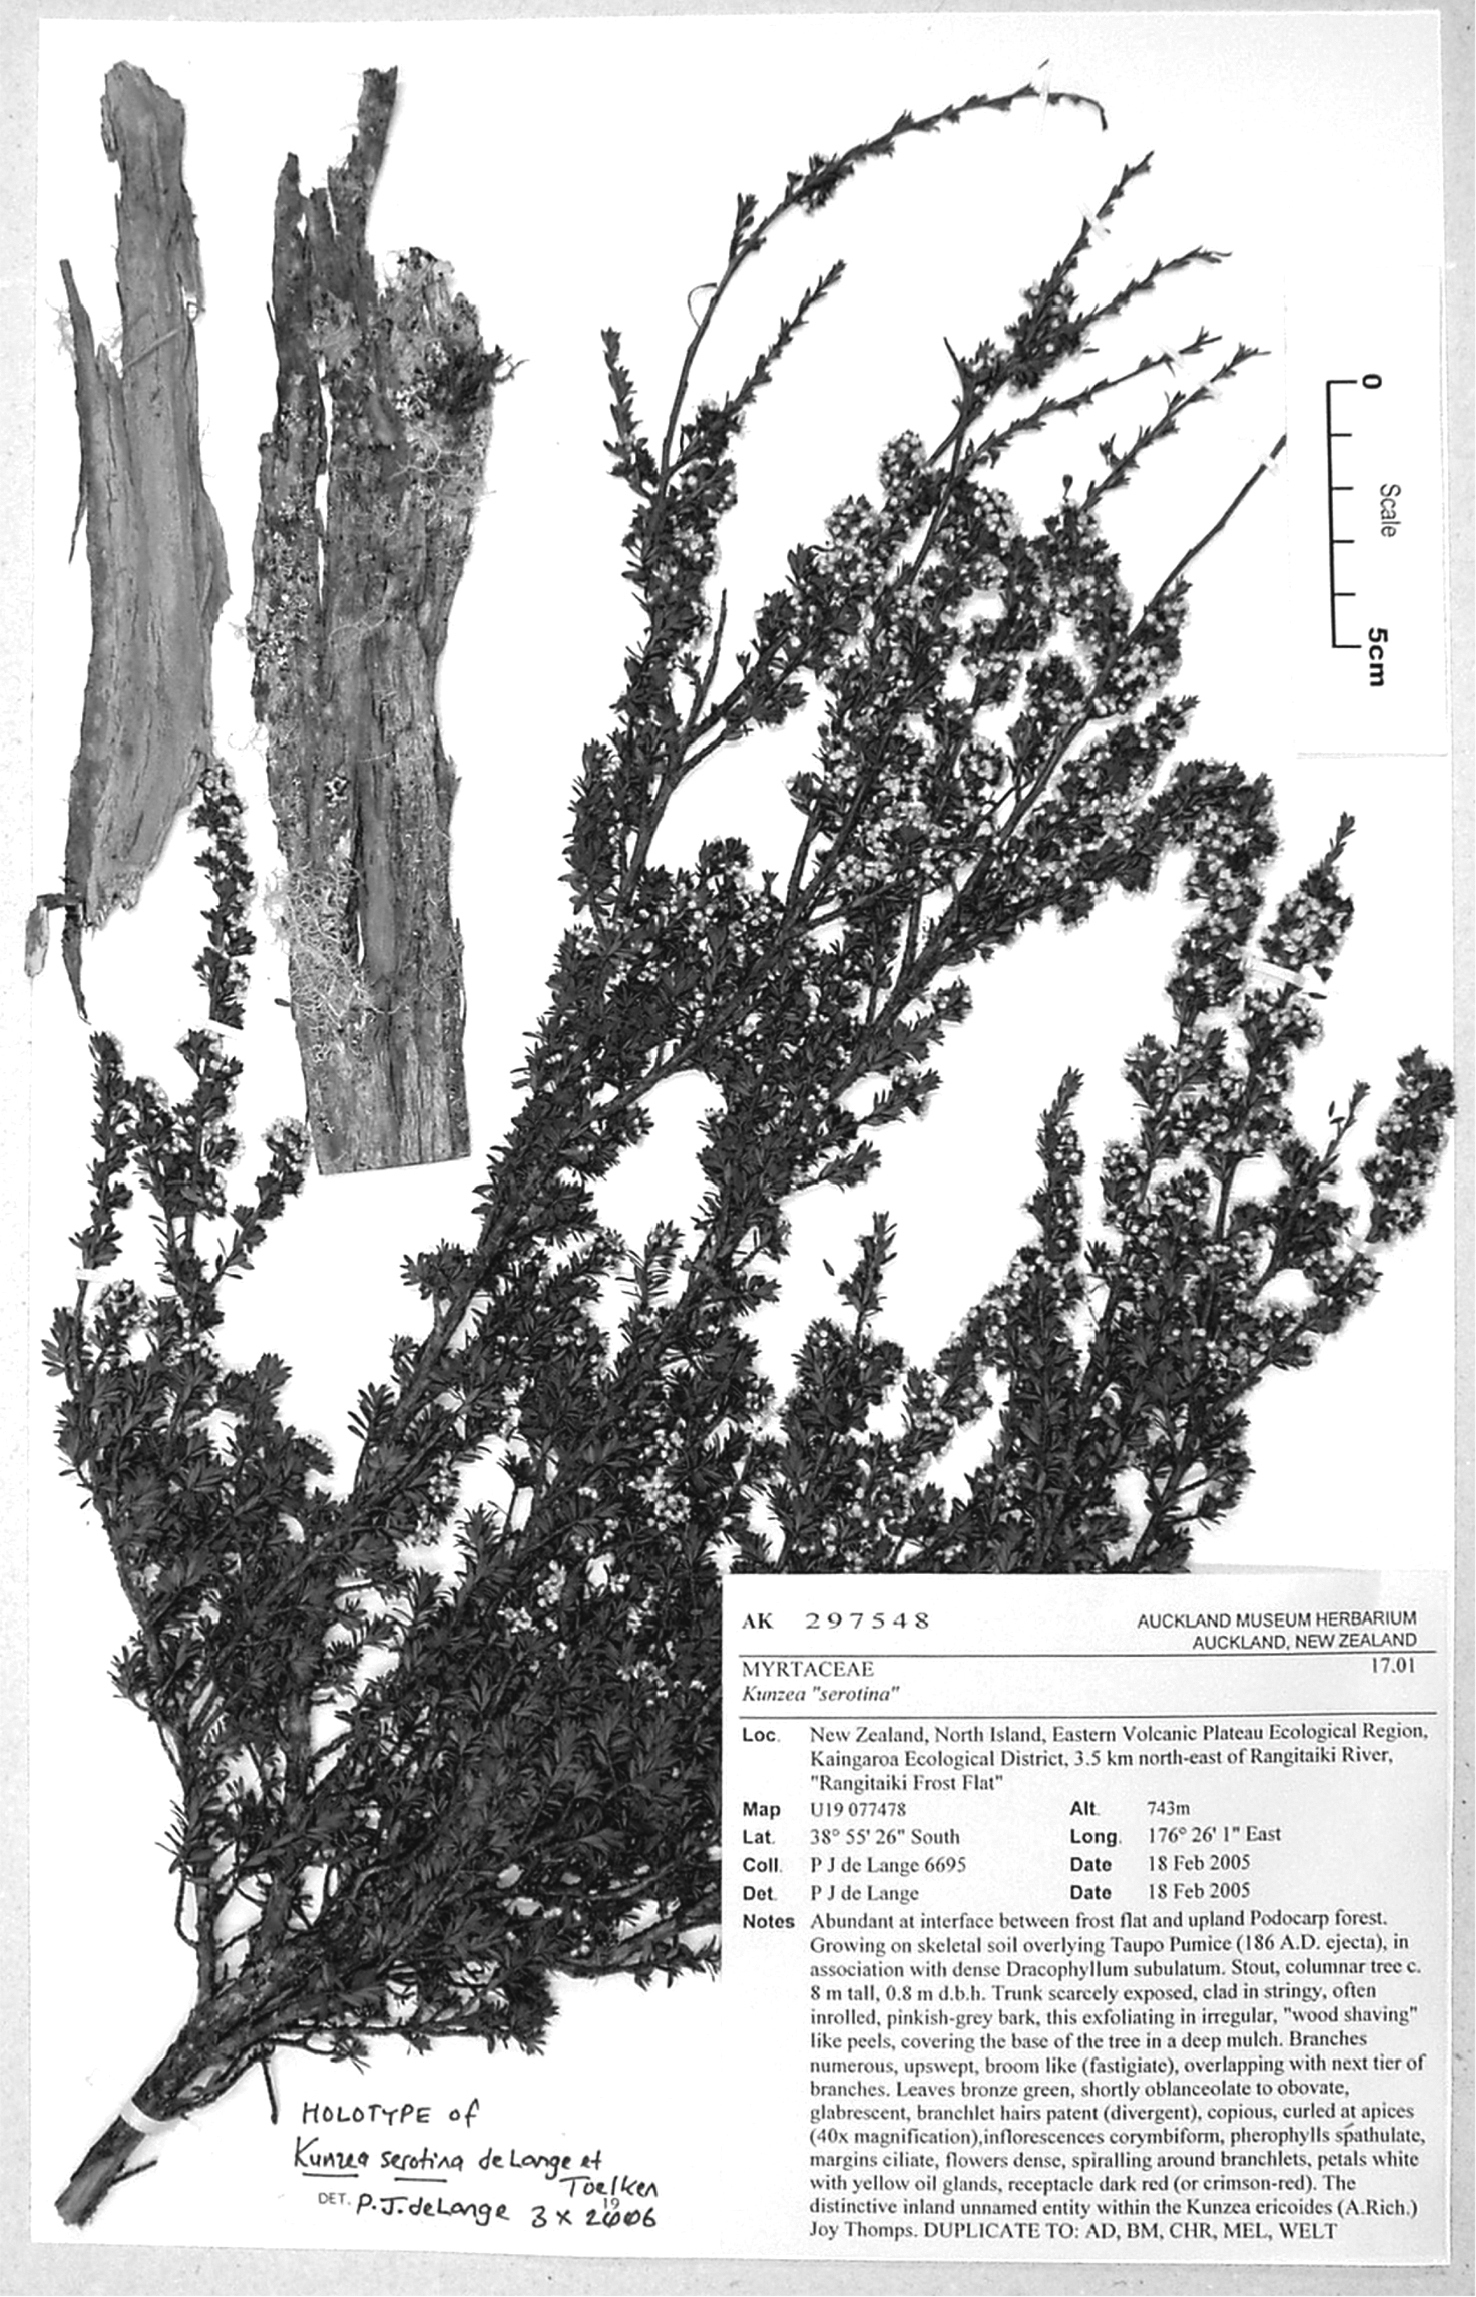 581.phytokeys 40 7973 sp 3 p 1